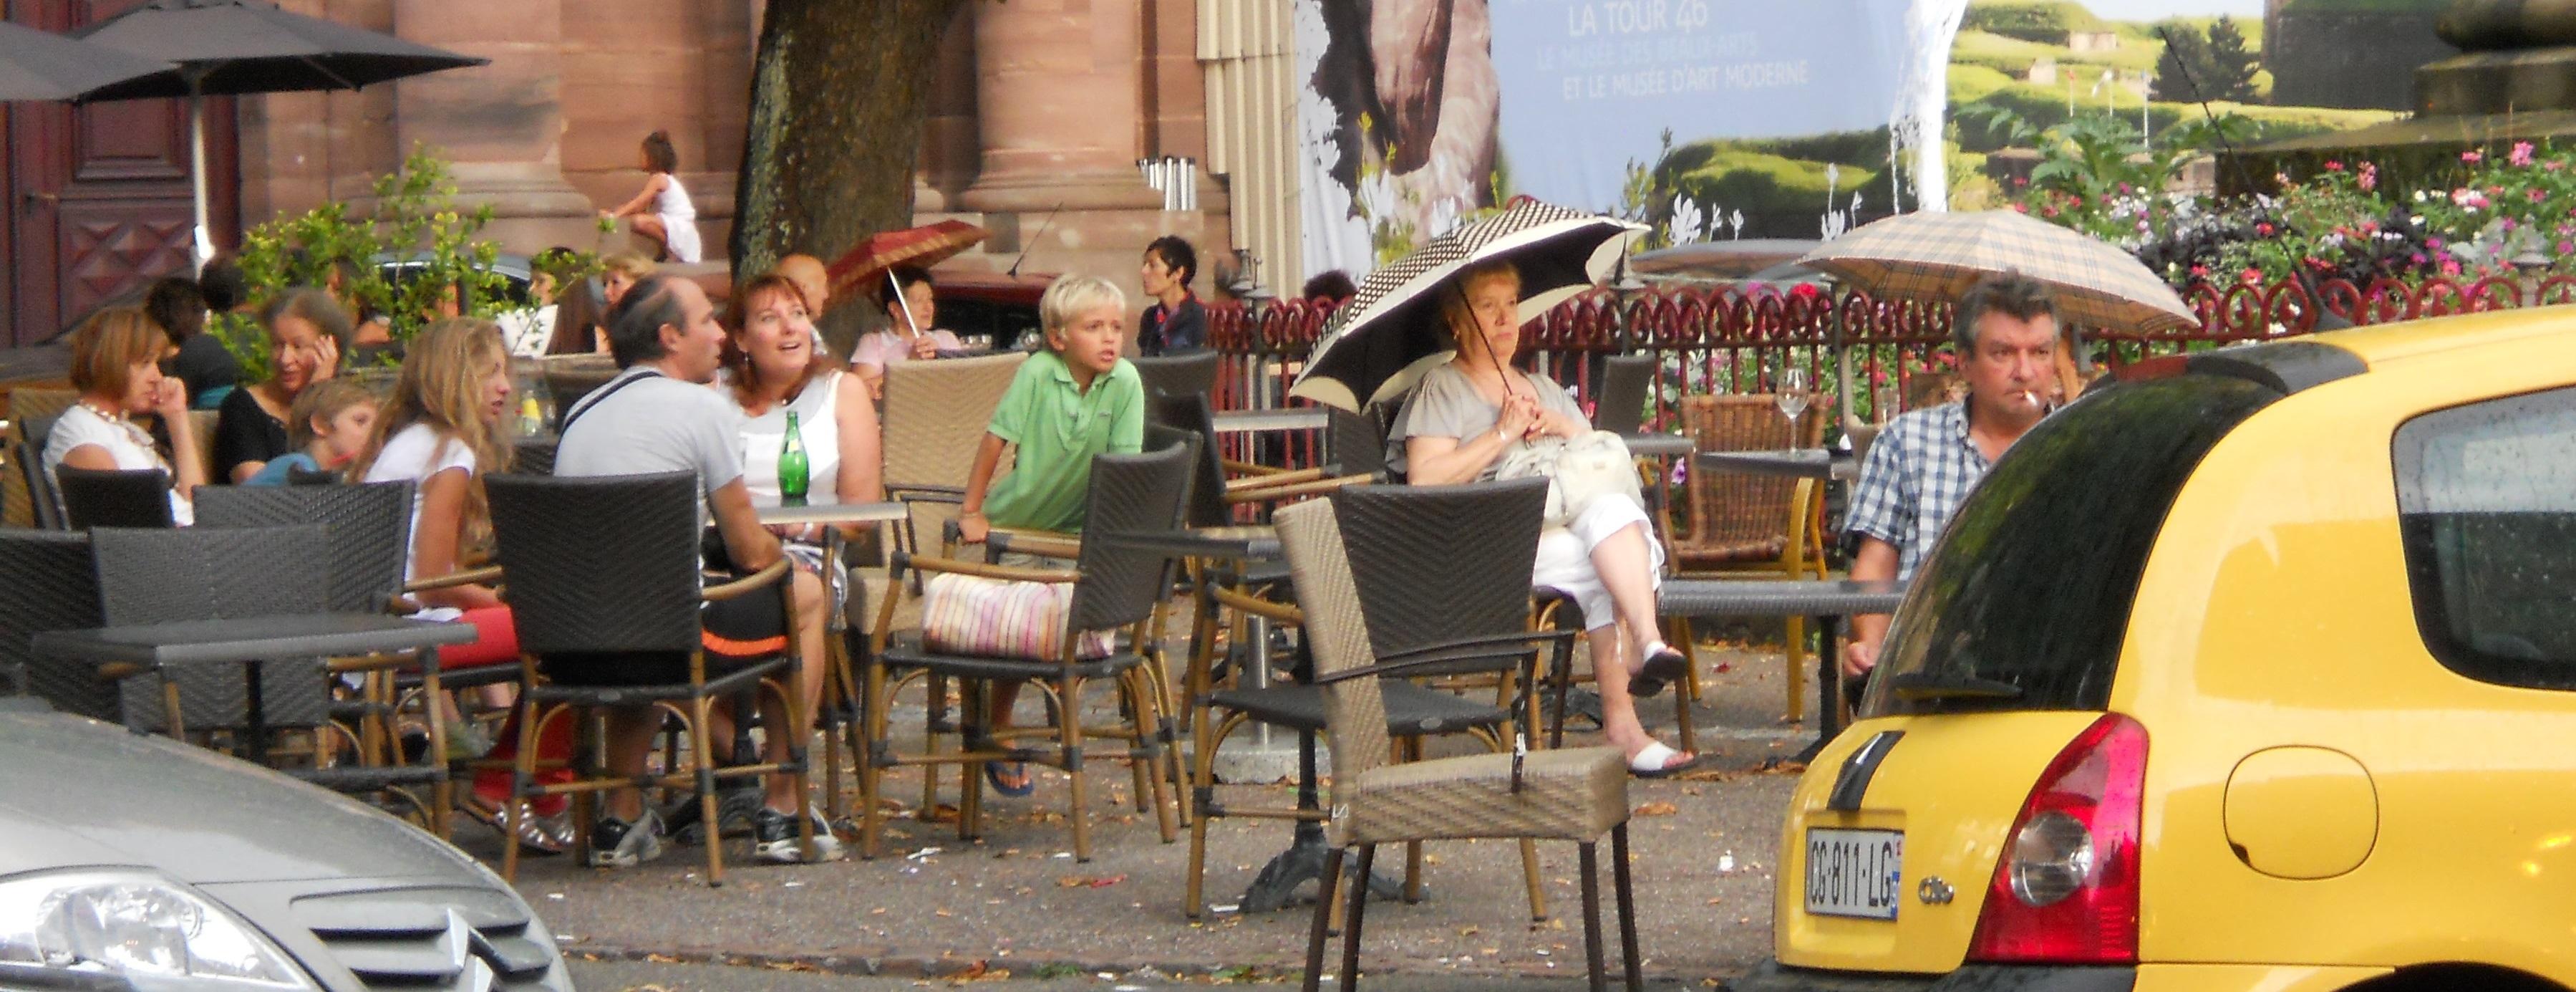 Französisches Innenstadtleben in Belfort.